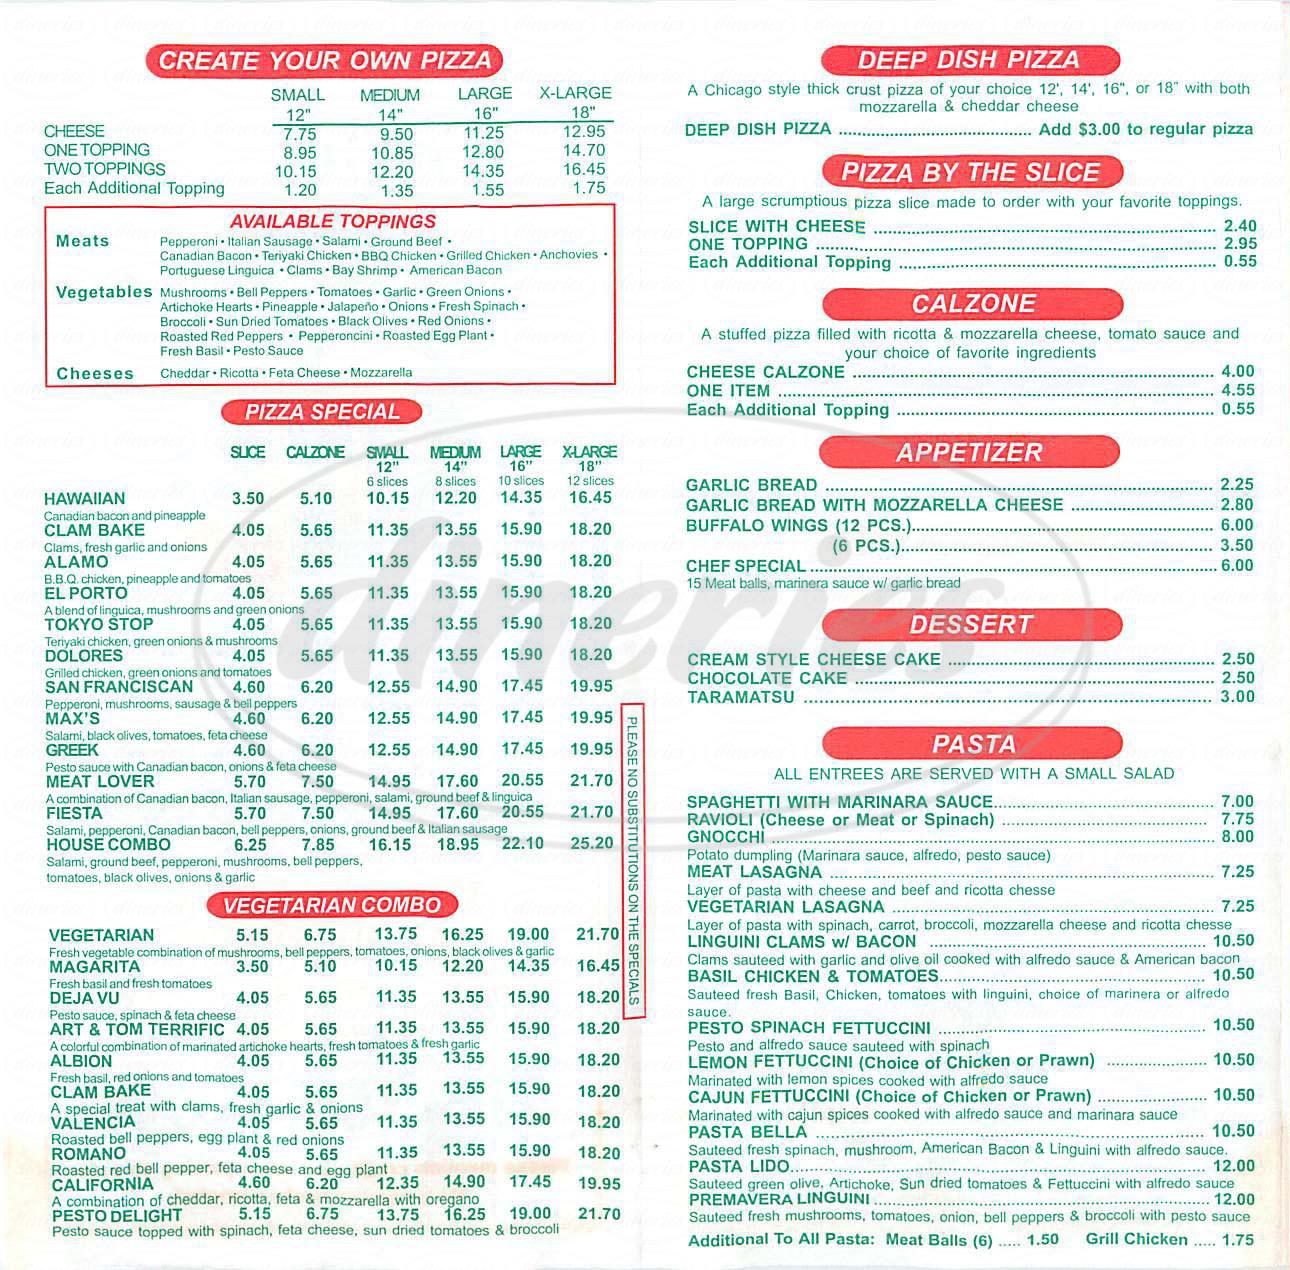 menu for Deja Vu Pizza and Pasta